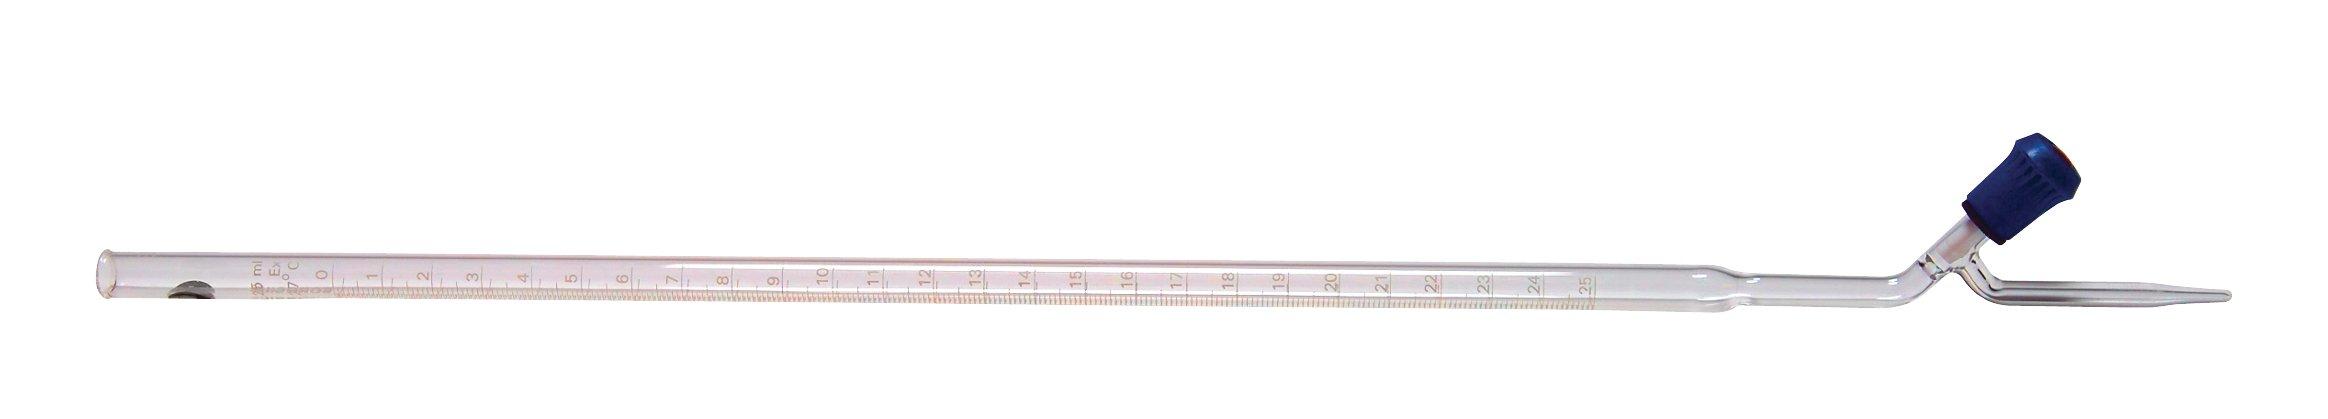 United Scientific BR2122-10 Burette with General Purpose Screw Thread Stopcocks with PTFE Keys, Class B, 10ml Capacity